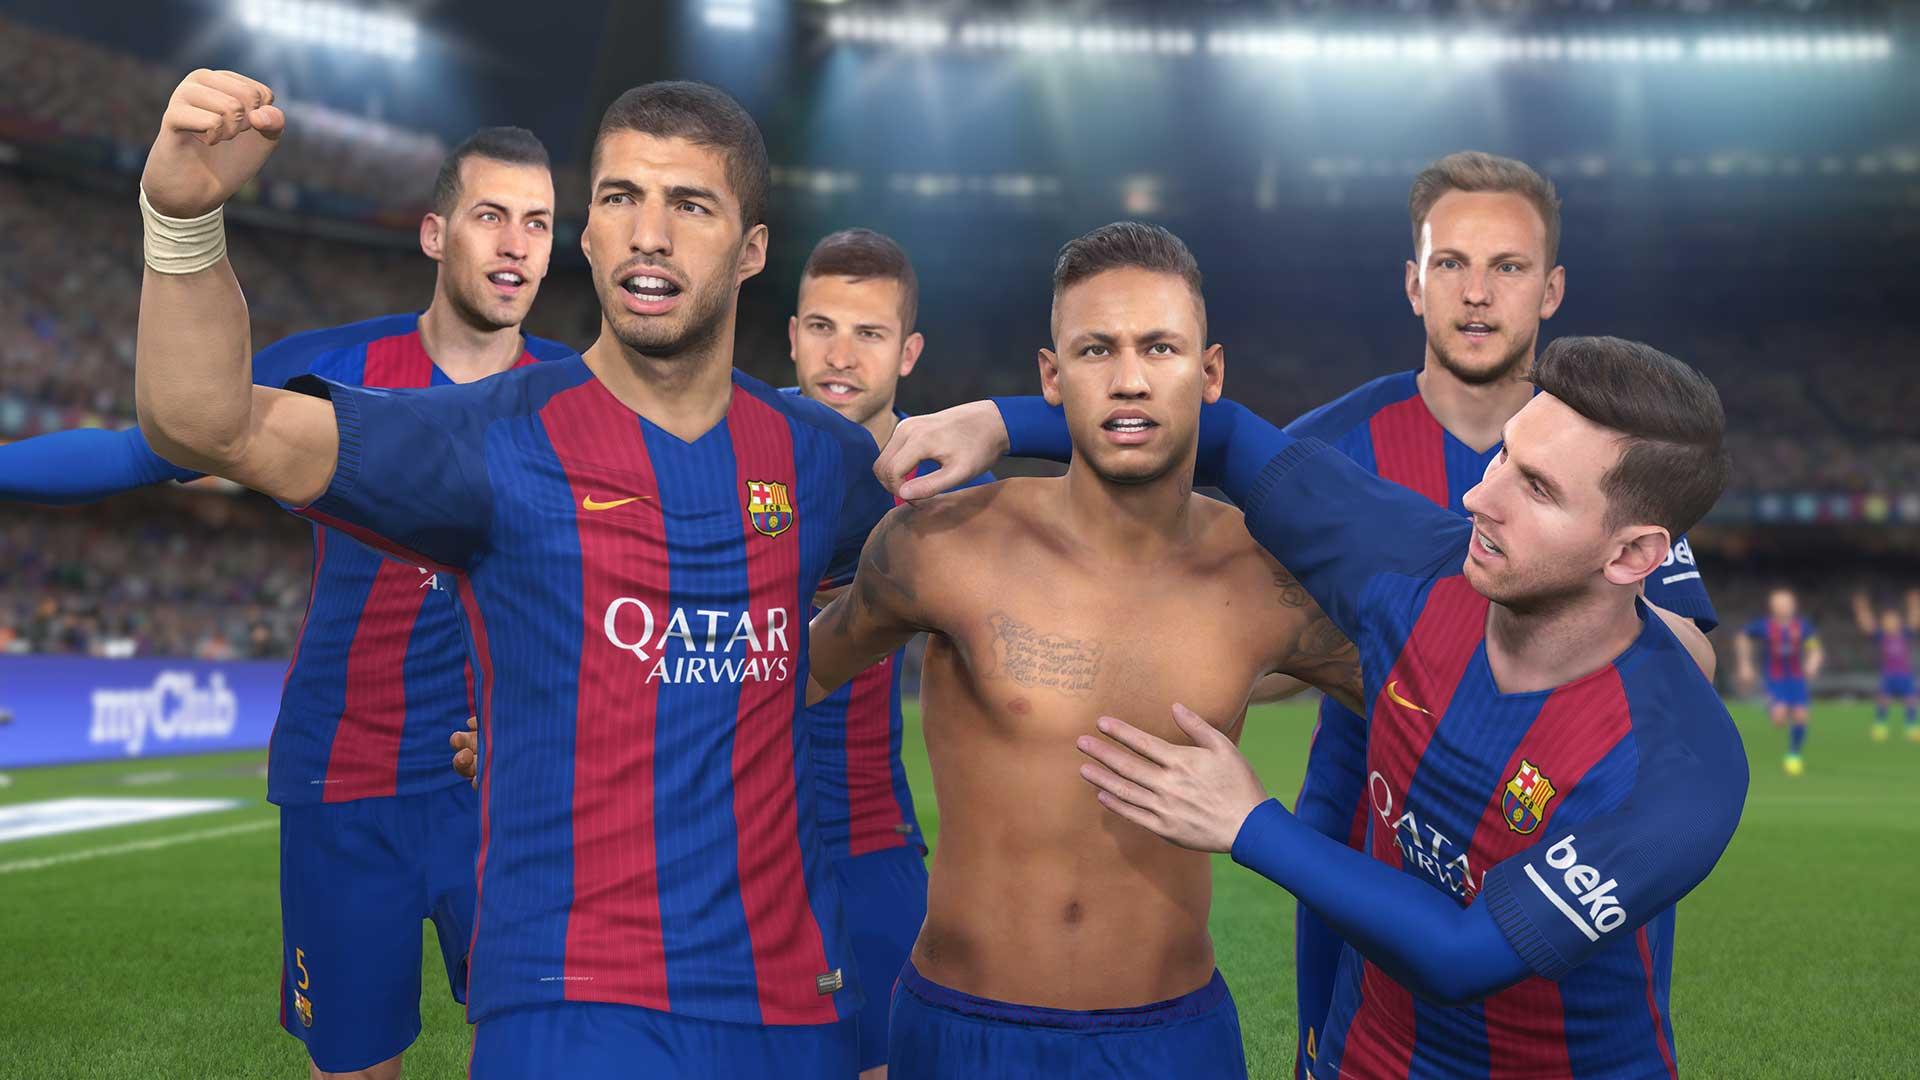 Copertina PES 2017, a tutto Barcellona: Messi, Neymar e Suarez